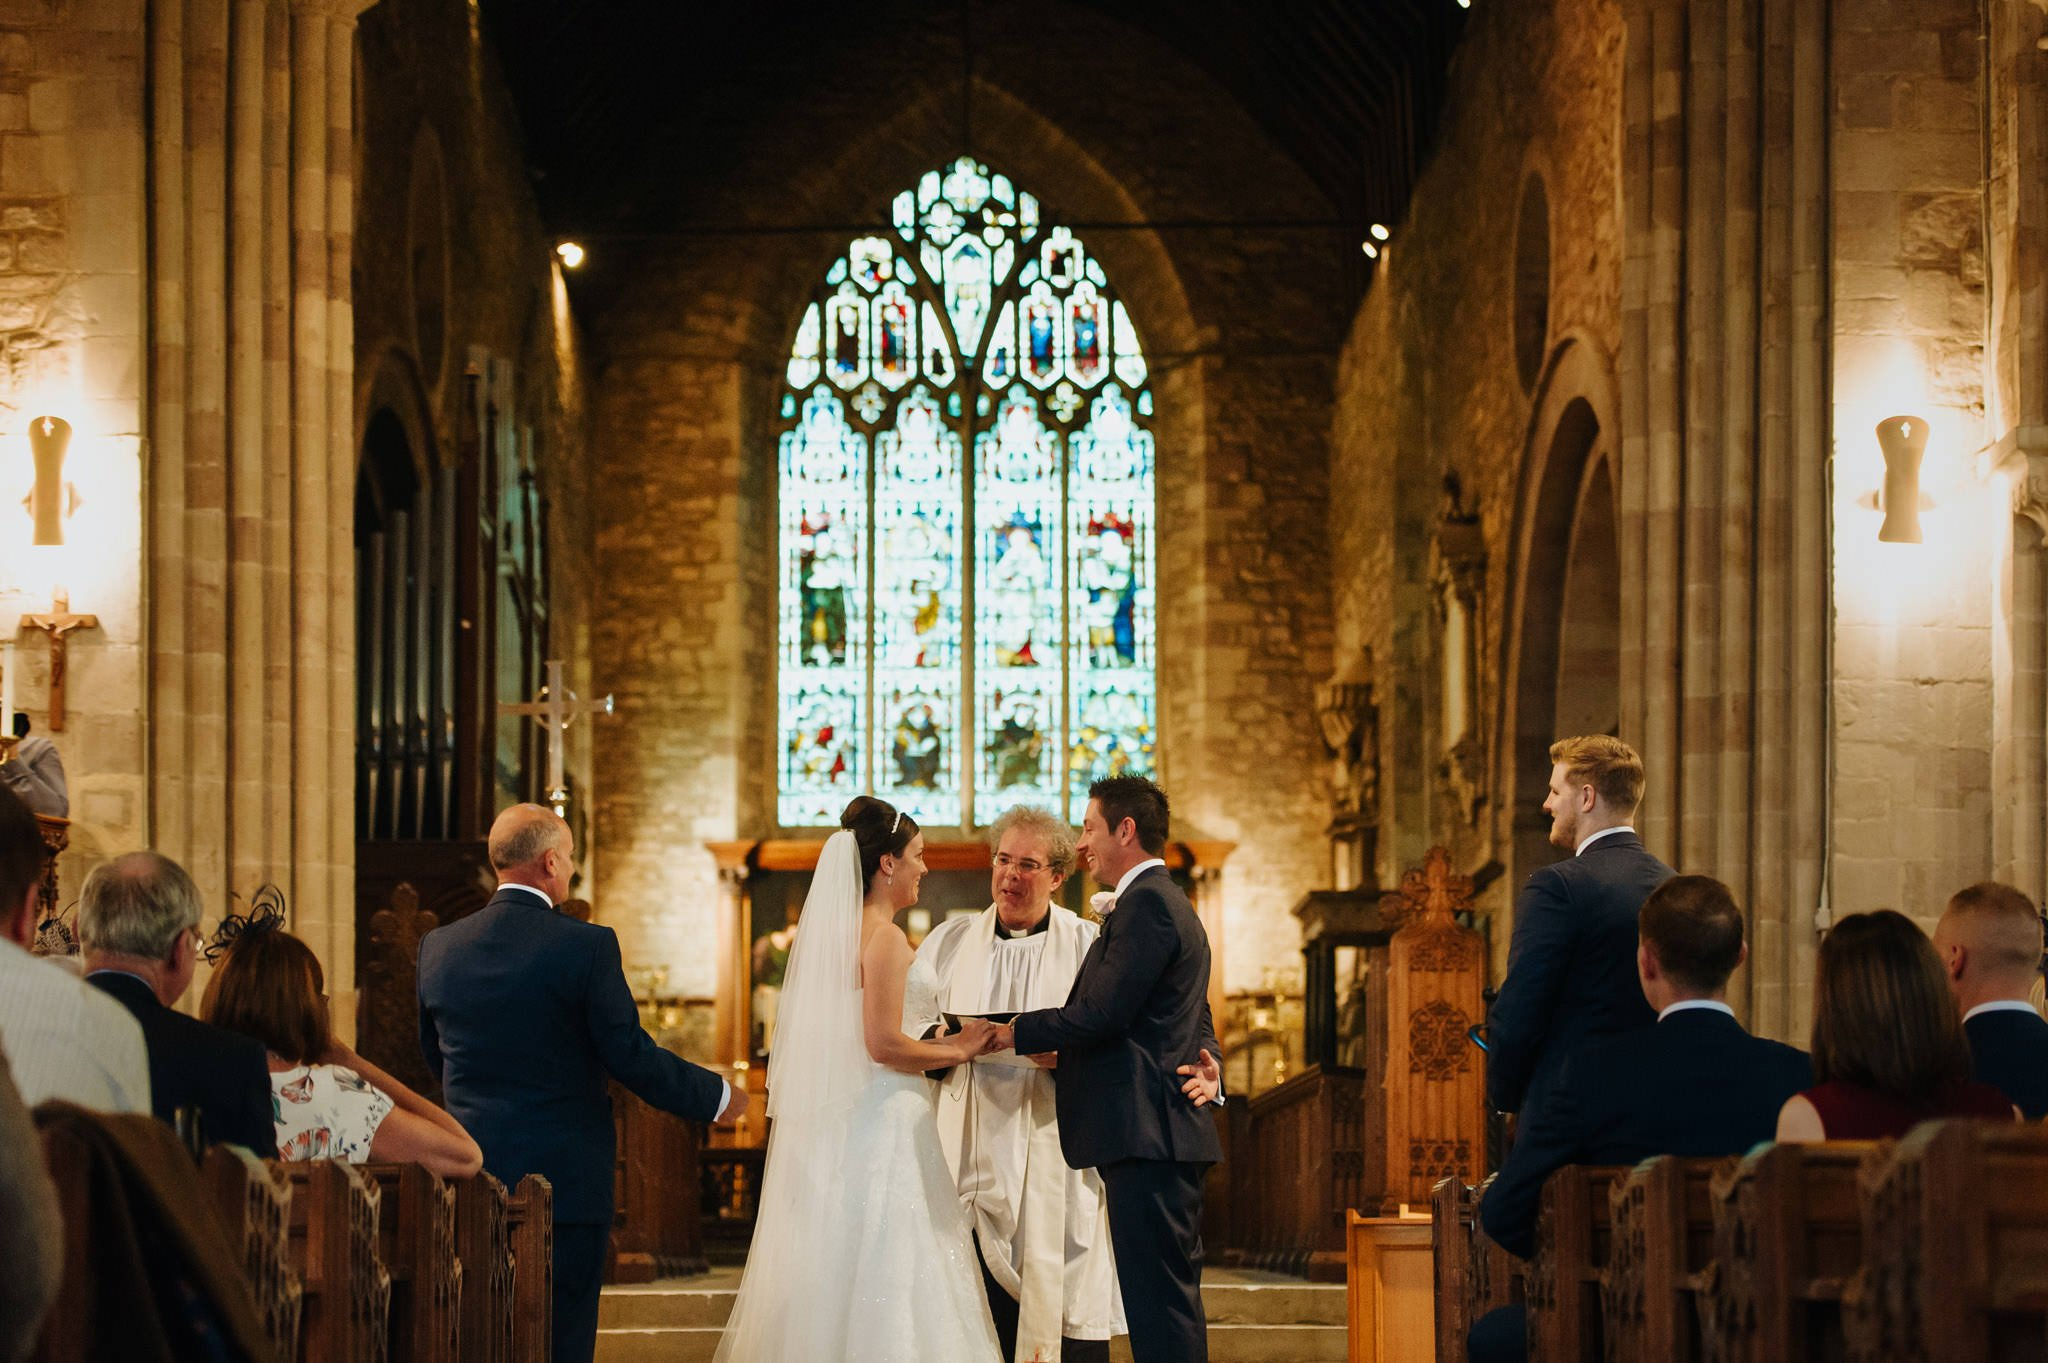 Eastnor Castle wedding photographer Herefordshire, West Midlands - Sarah + Dean 28